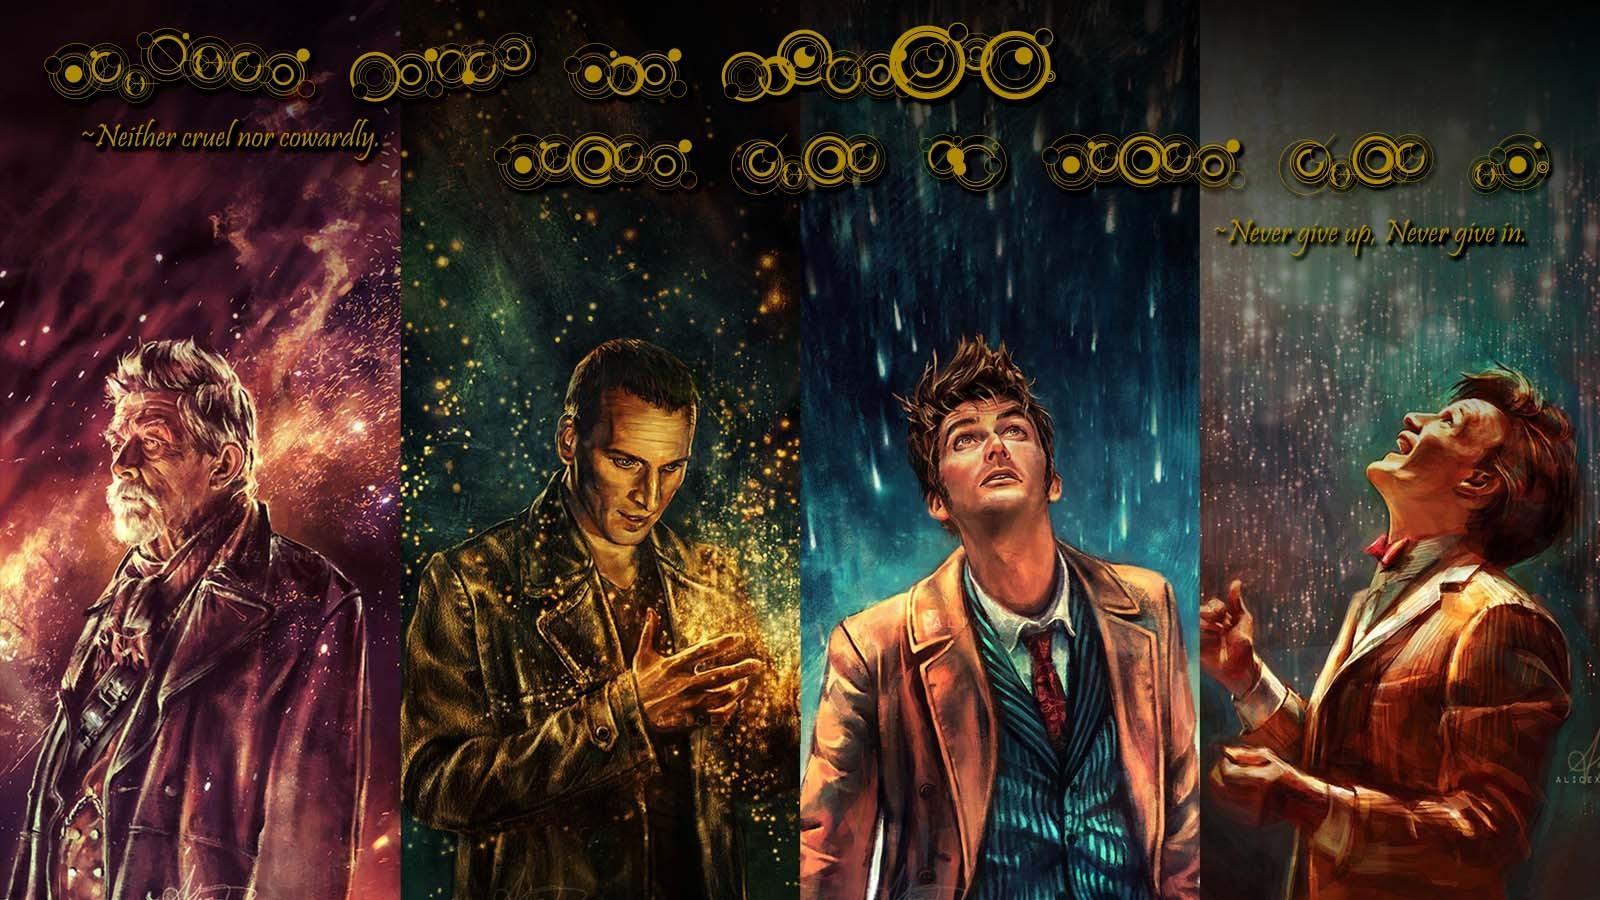 Doctor Who Desktop Wallpaper Hd: Doctor Who Hurt Christopher Eccleston David Tennant Matt